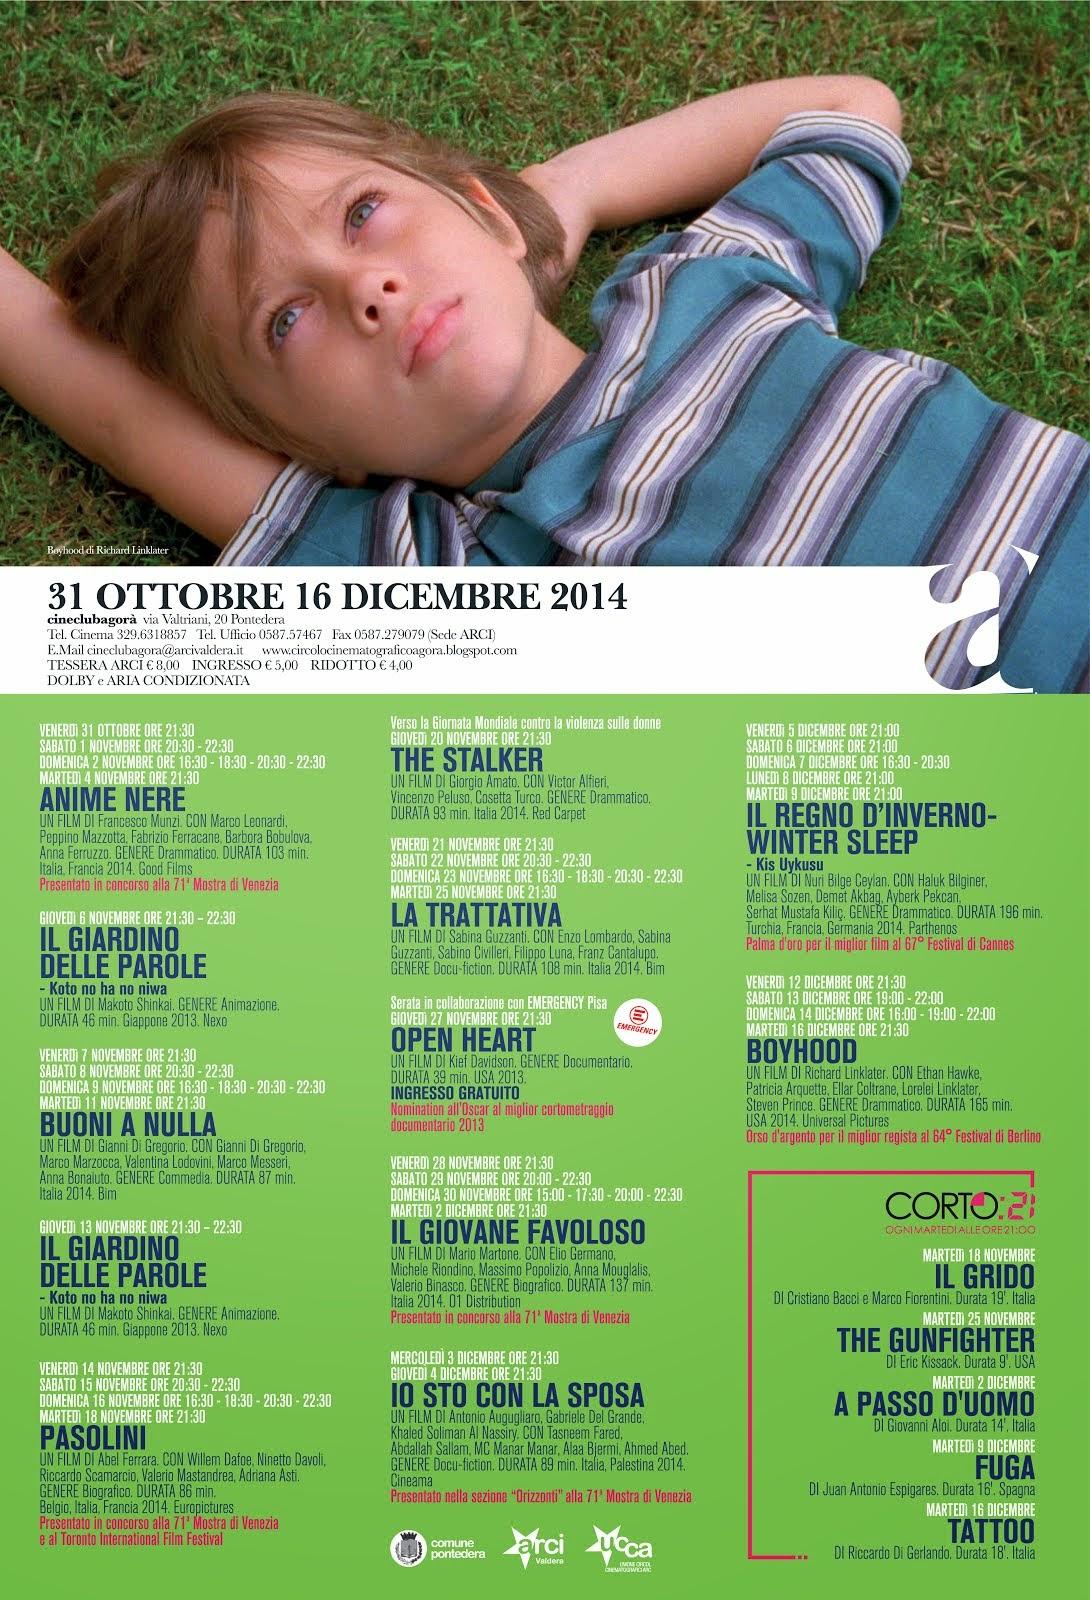 Programma dal 31 ottobre al 16 dicembre 2014